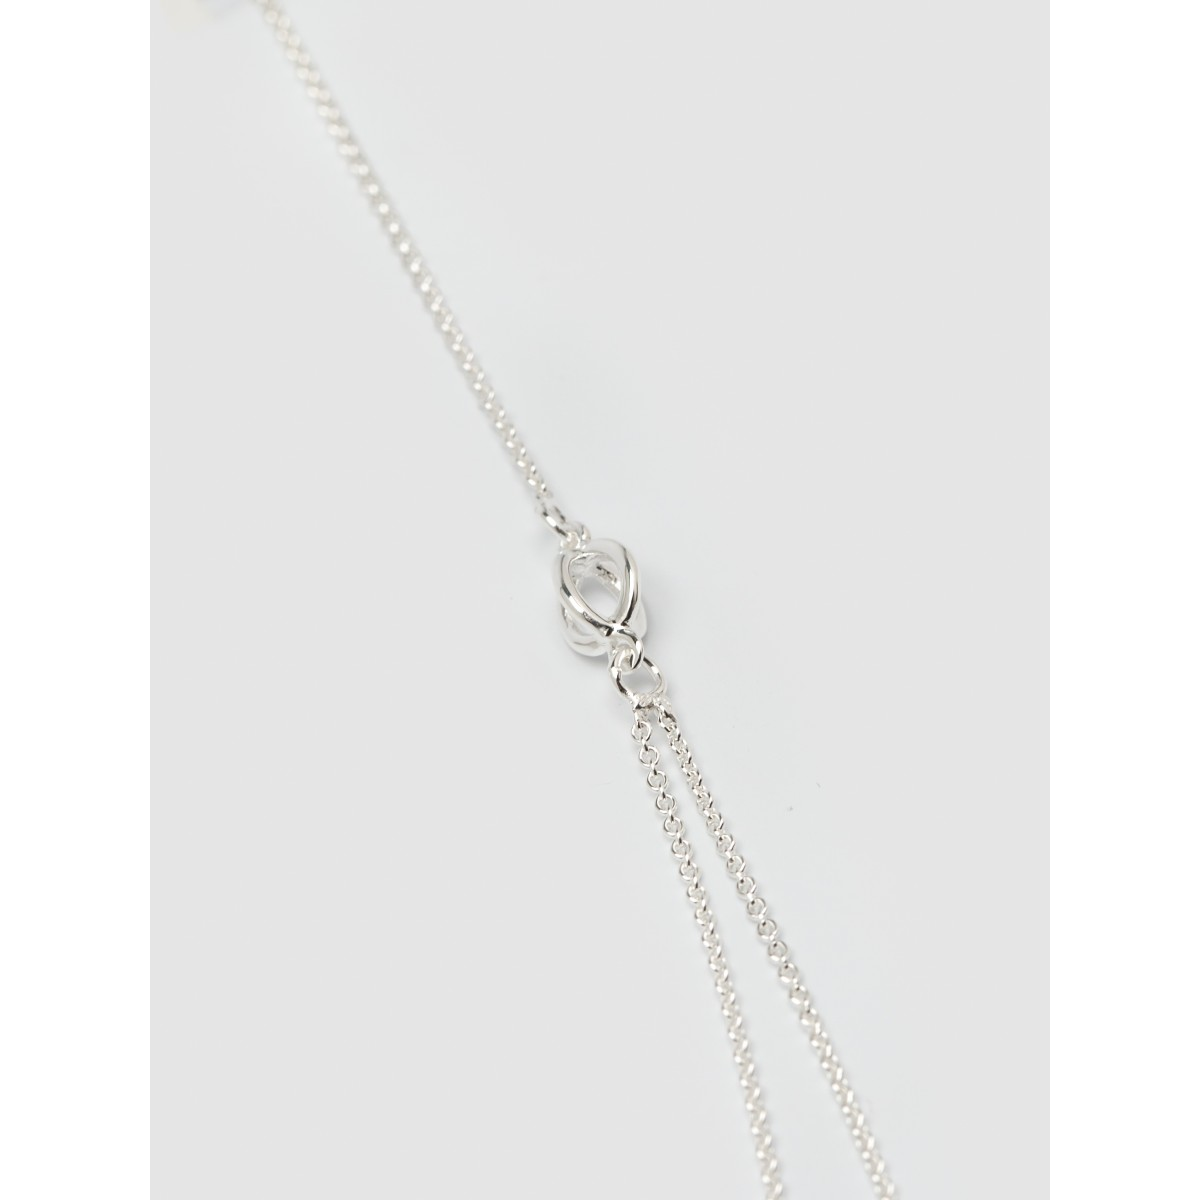 Jonathan Radetz Jewellery, Kette KISSKISS TWO, Länge 43cm Silber 925